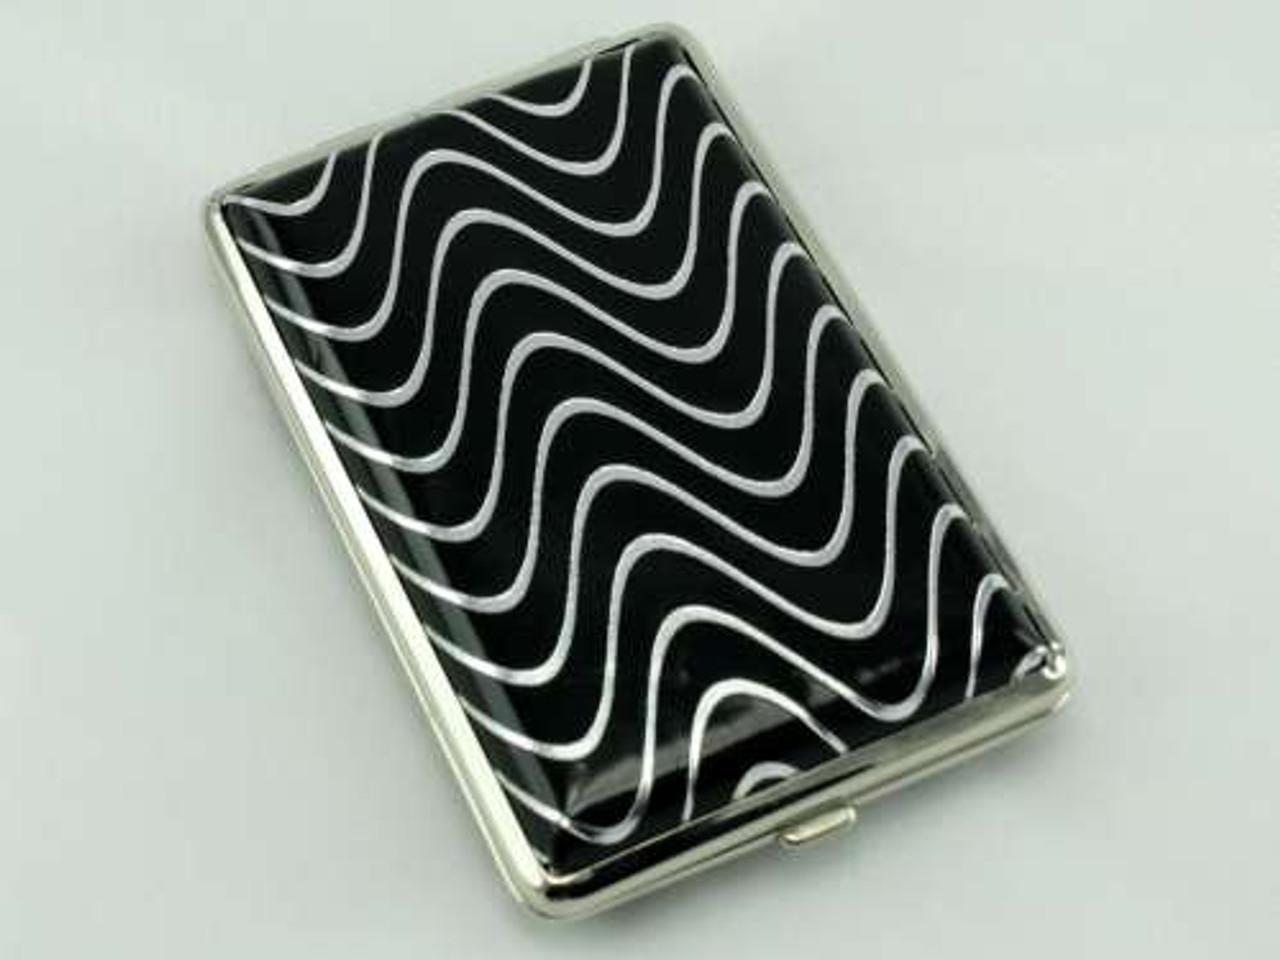 Blackened Wave Cigarette Case